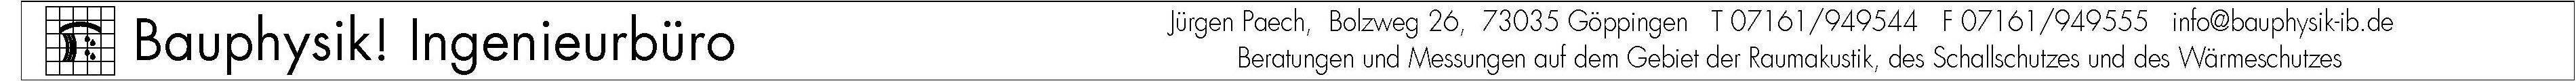 Bauphysik Ingenieurbüro Jürgen Paech